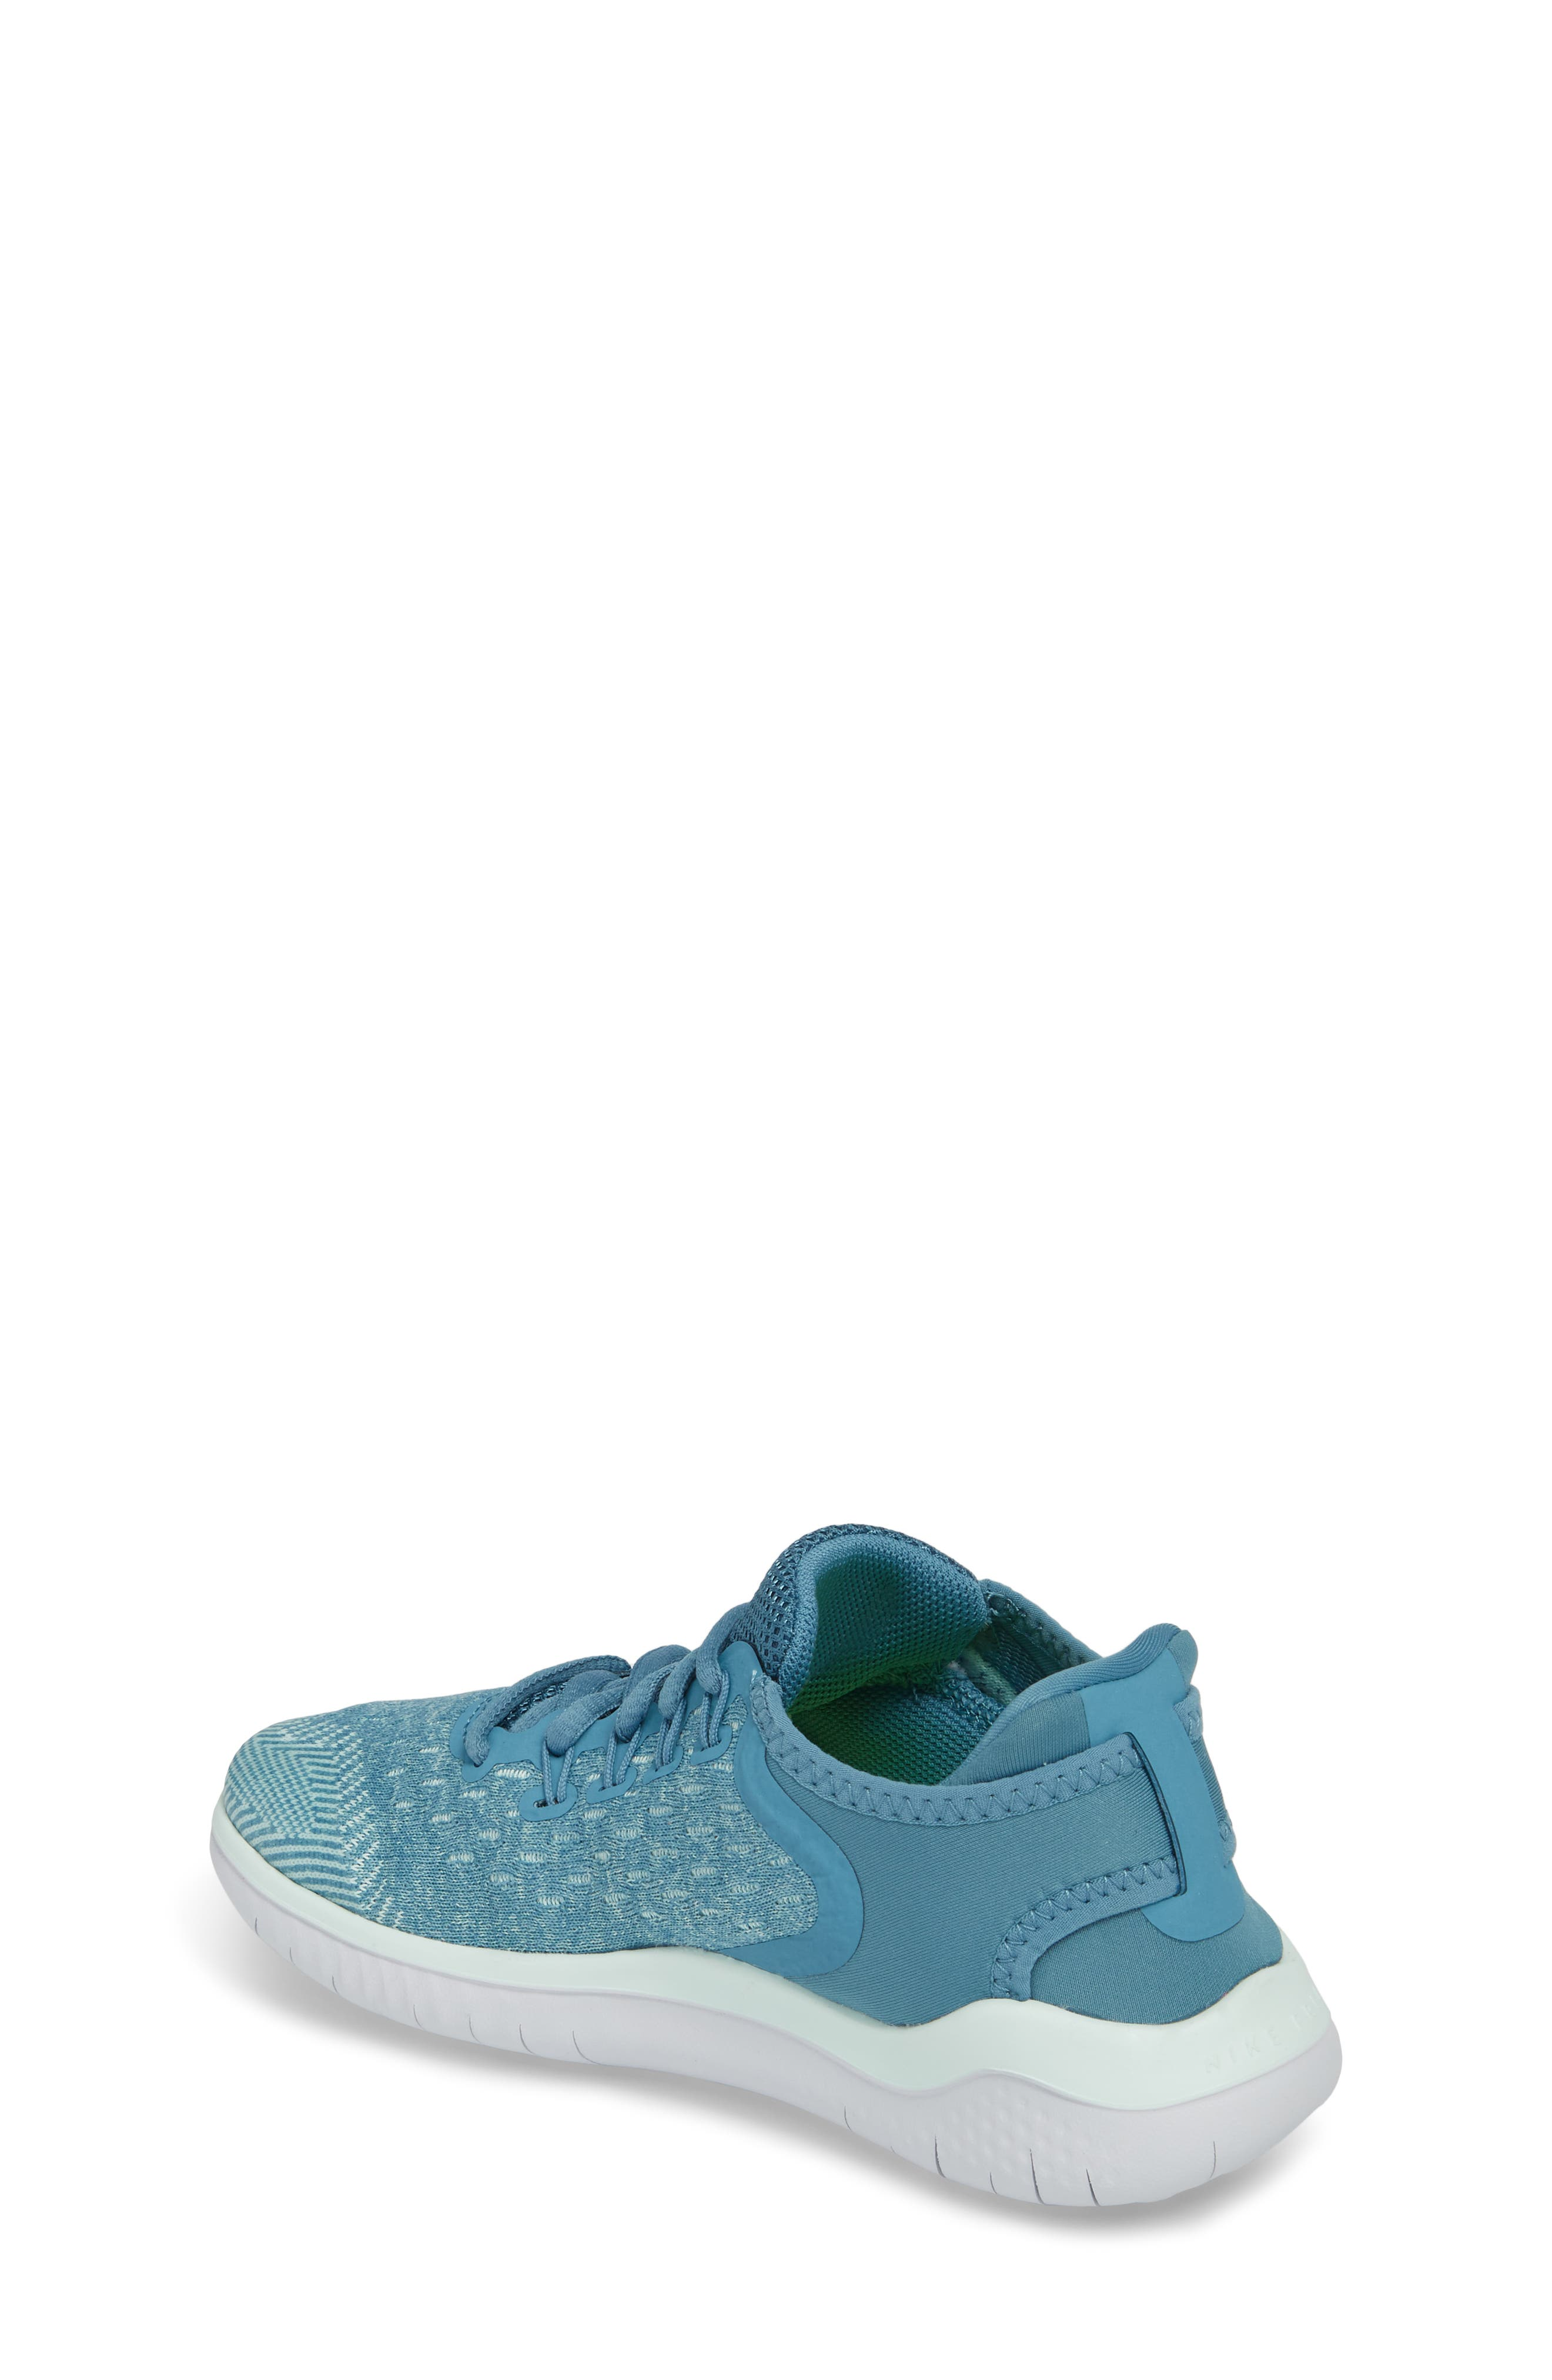 Free RN 2018 Running Shoe,                             Alternate thumbnail 2, color,                             AQUA/ WHITE/ PURE PLATINUM